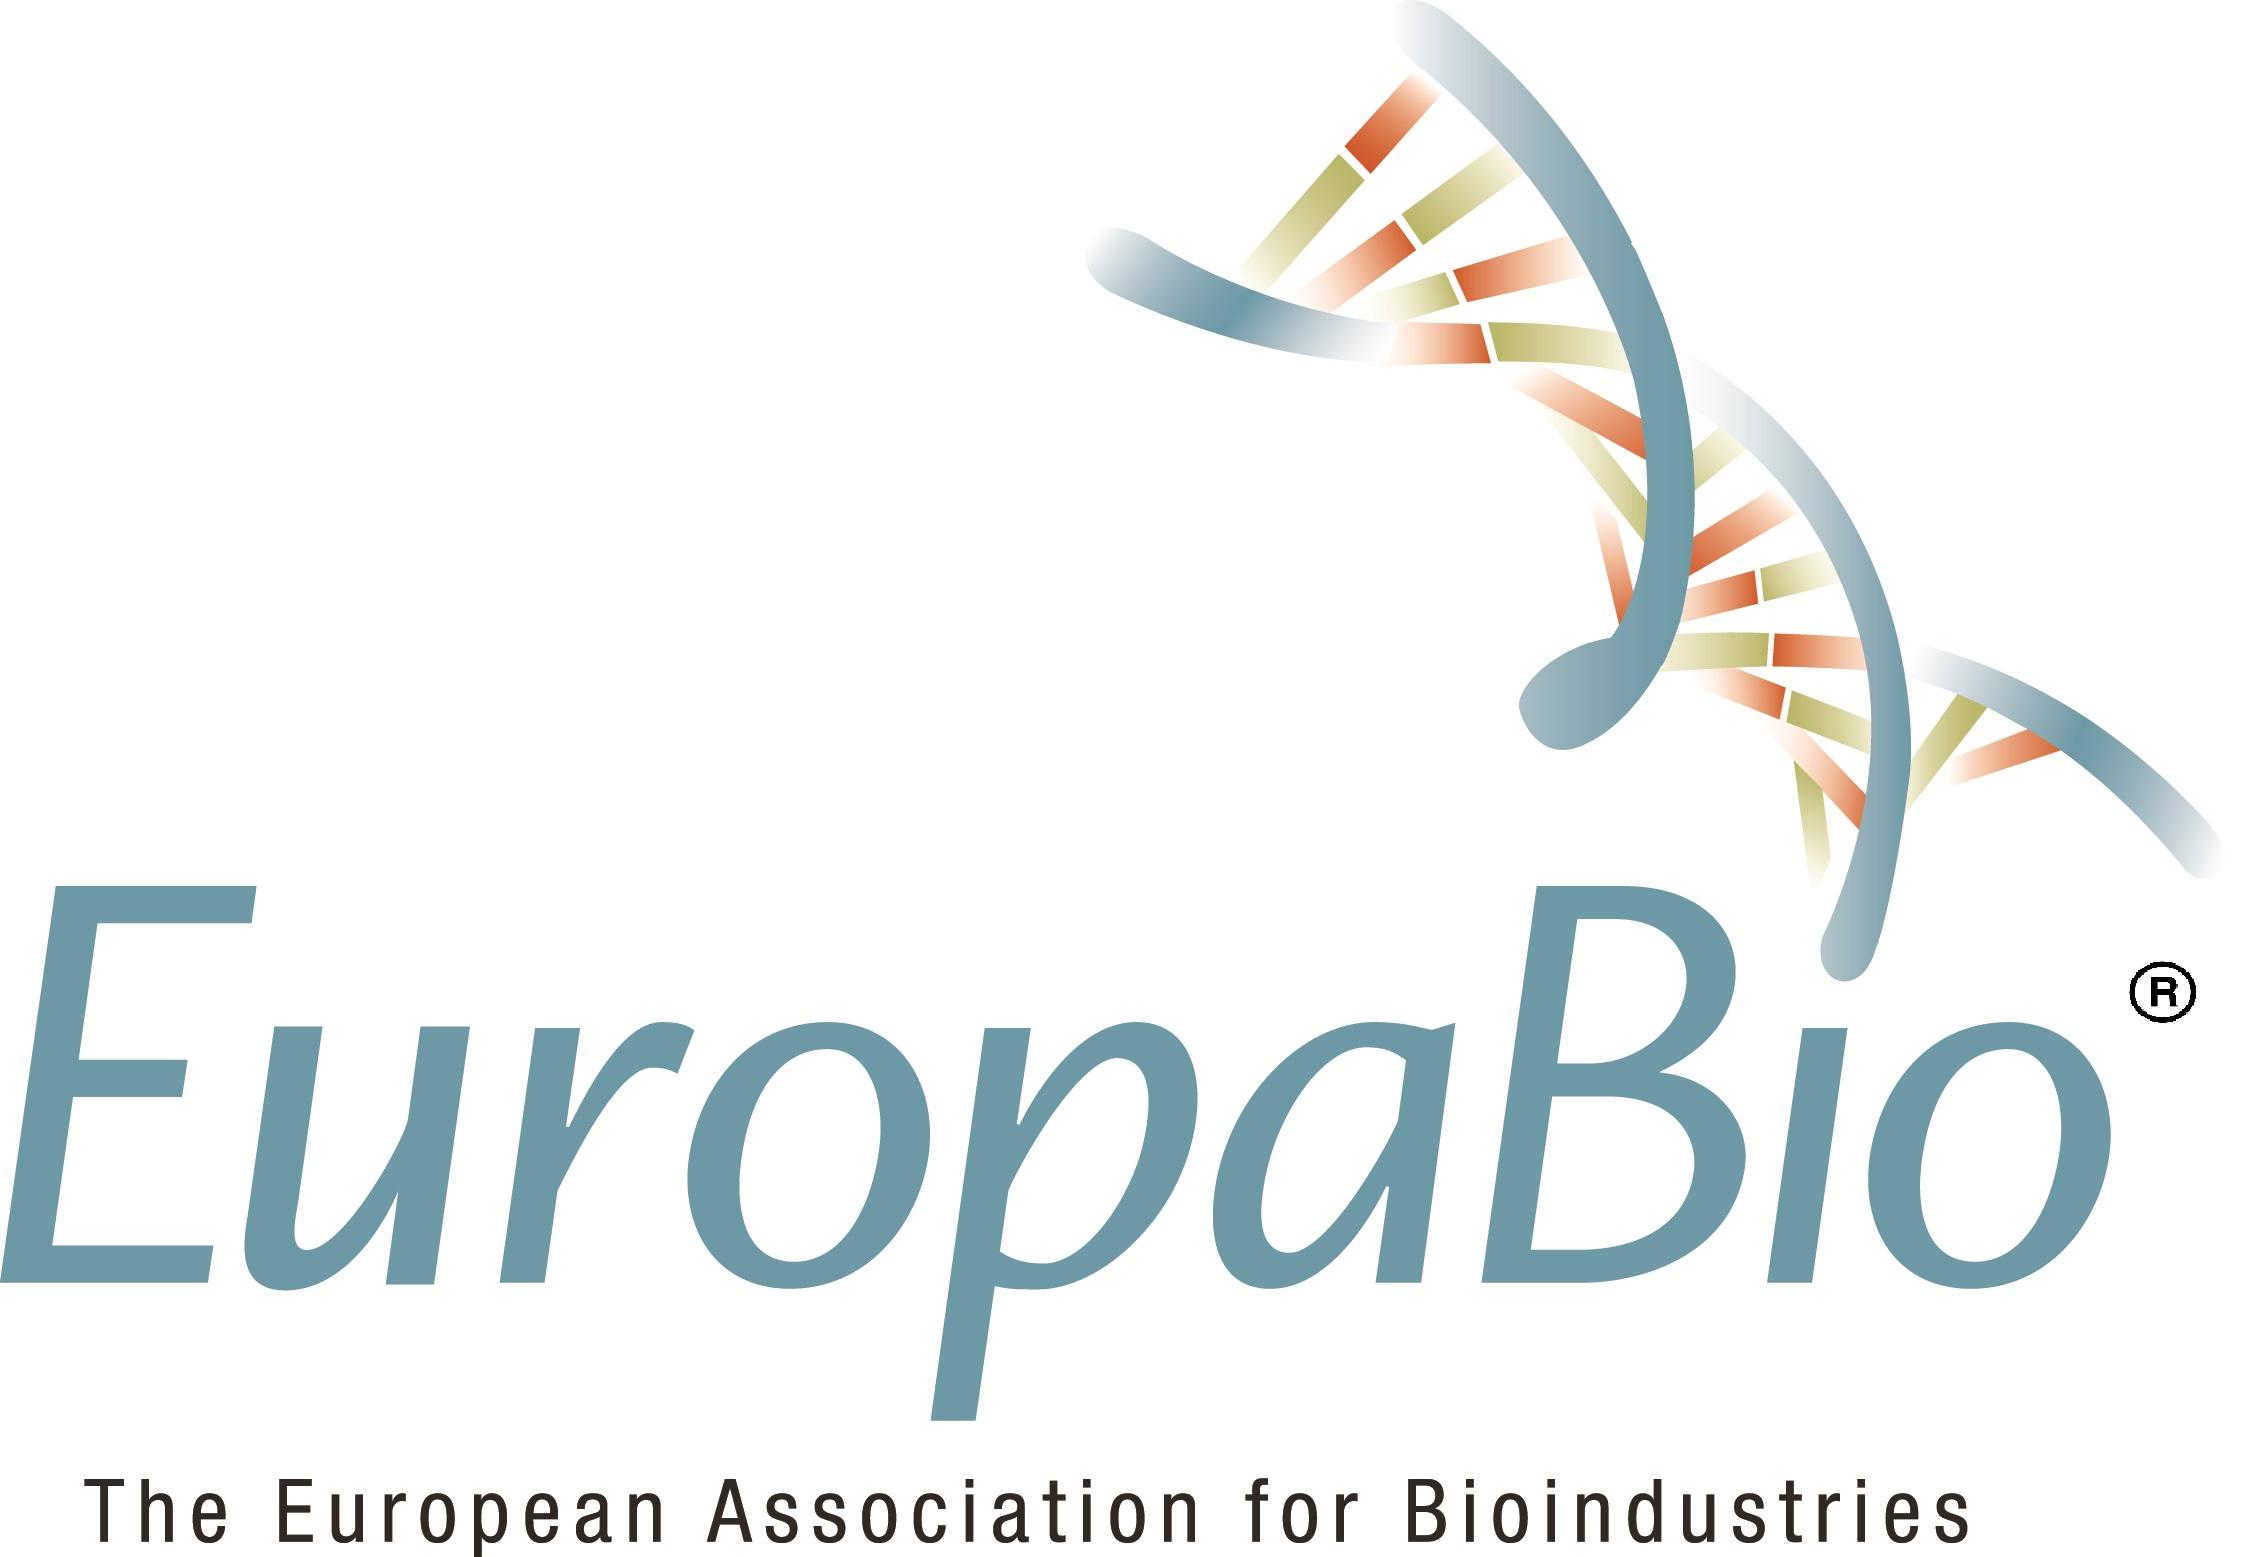 logo for European Association of Bioindustries